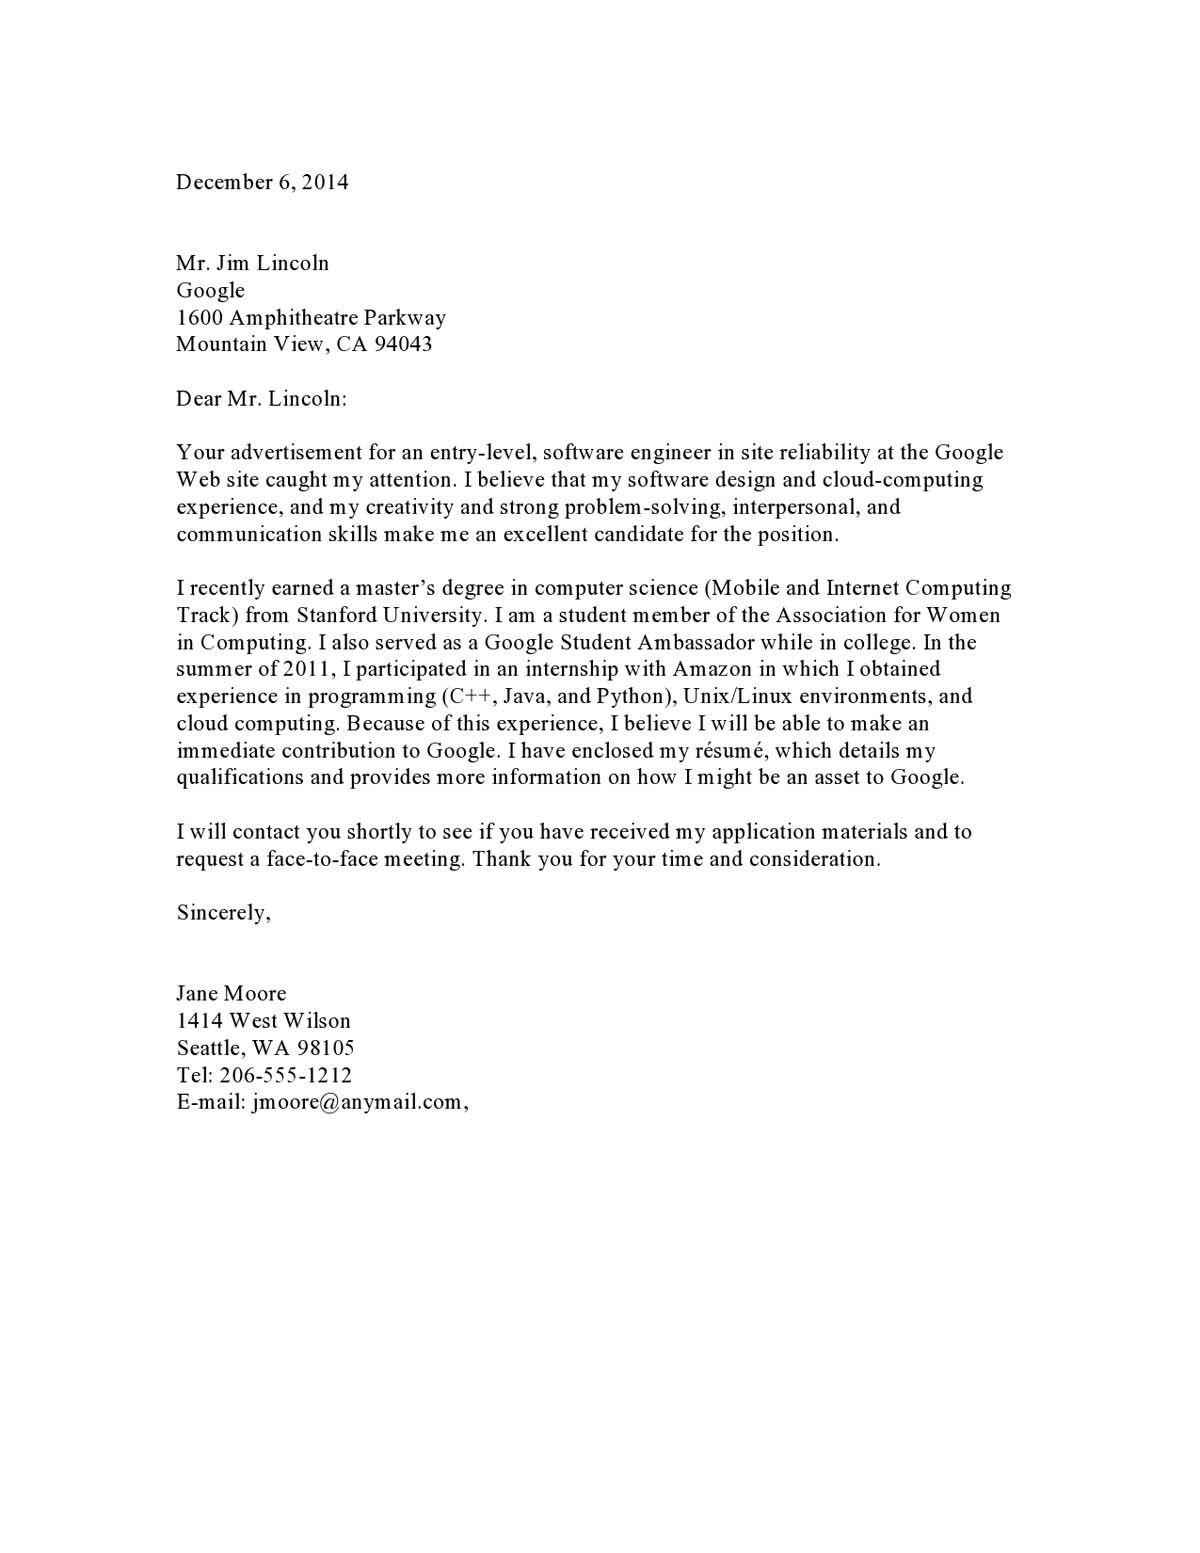 Cover Letter For Internship Sample Simple Template Design Cover Letter For Resume Cover Letter For Internship Cover Letter Template Free